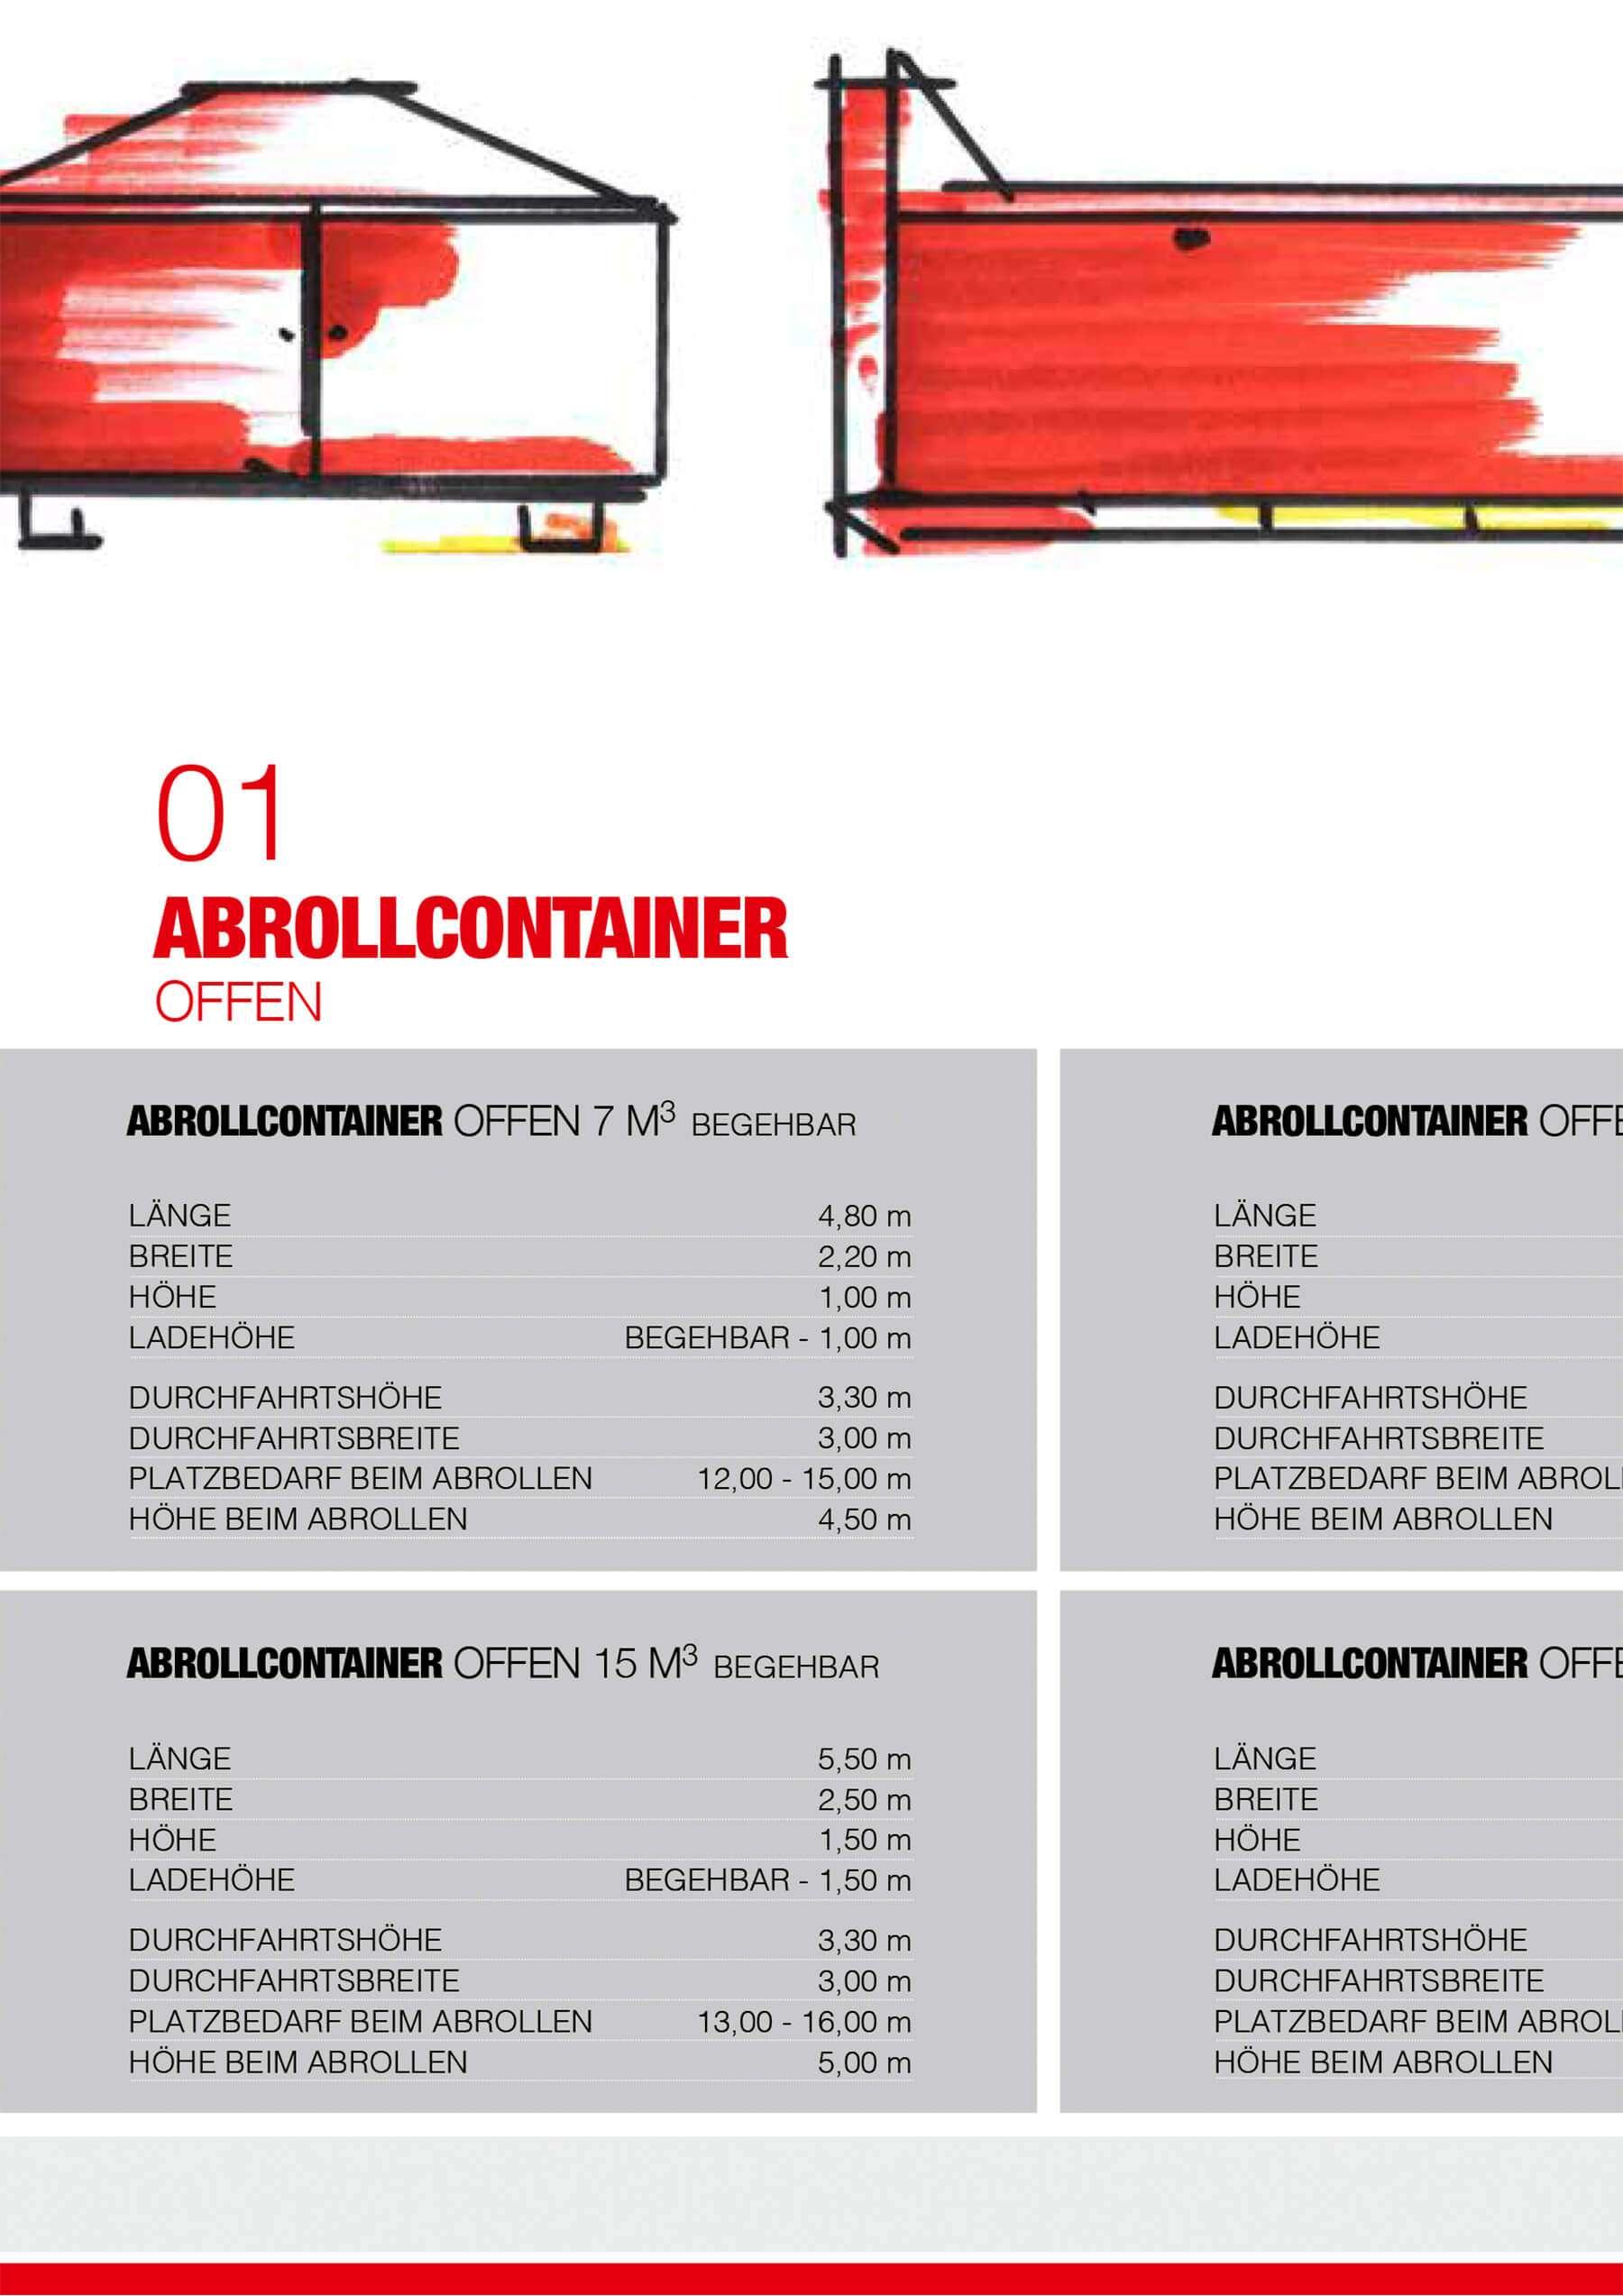 Schutt Karl |Datenblatt Container